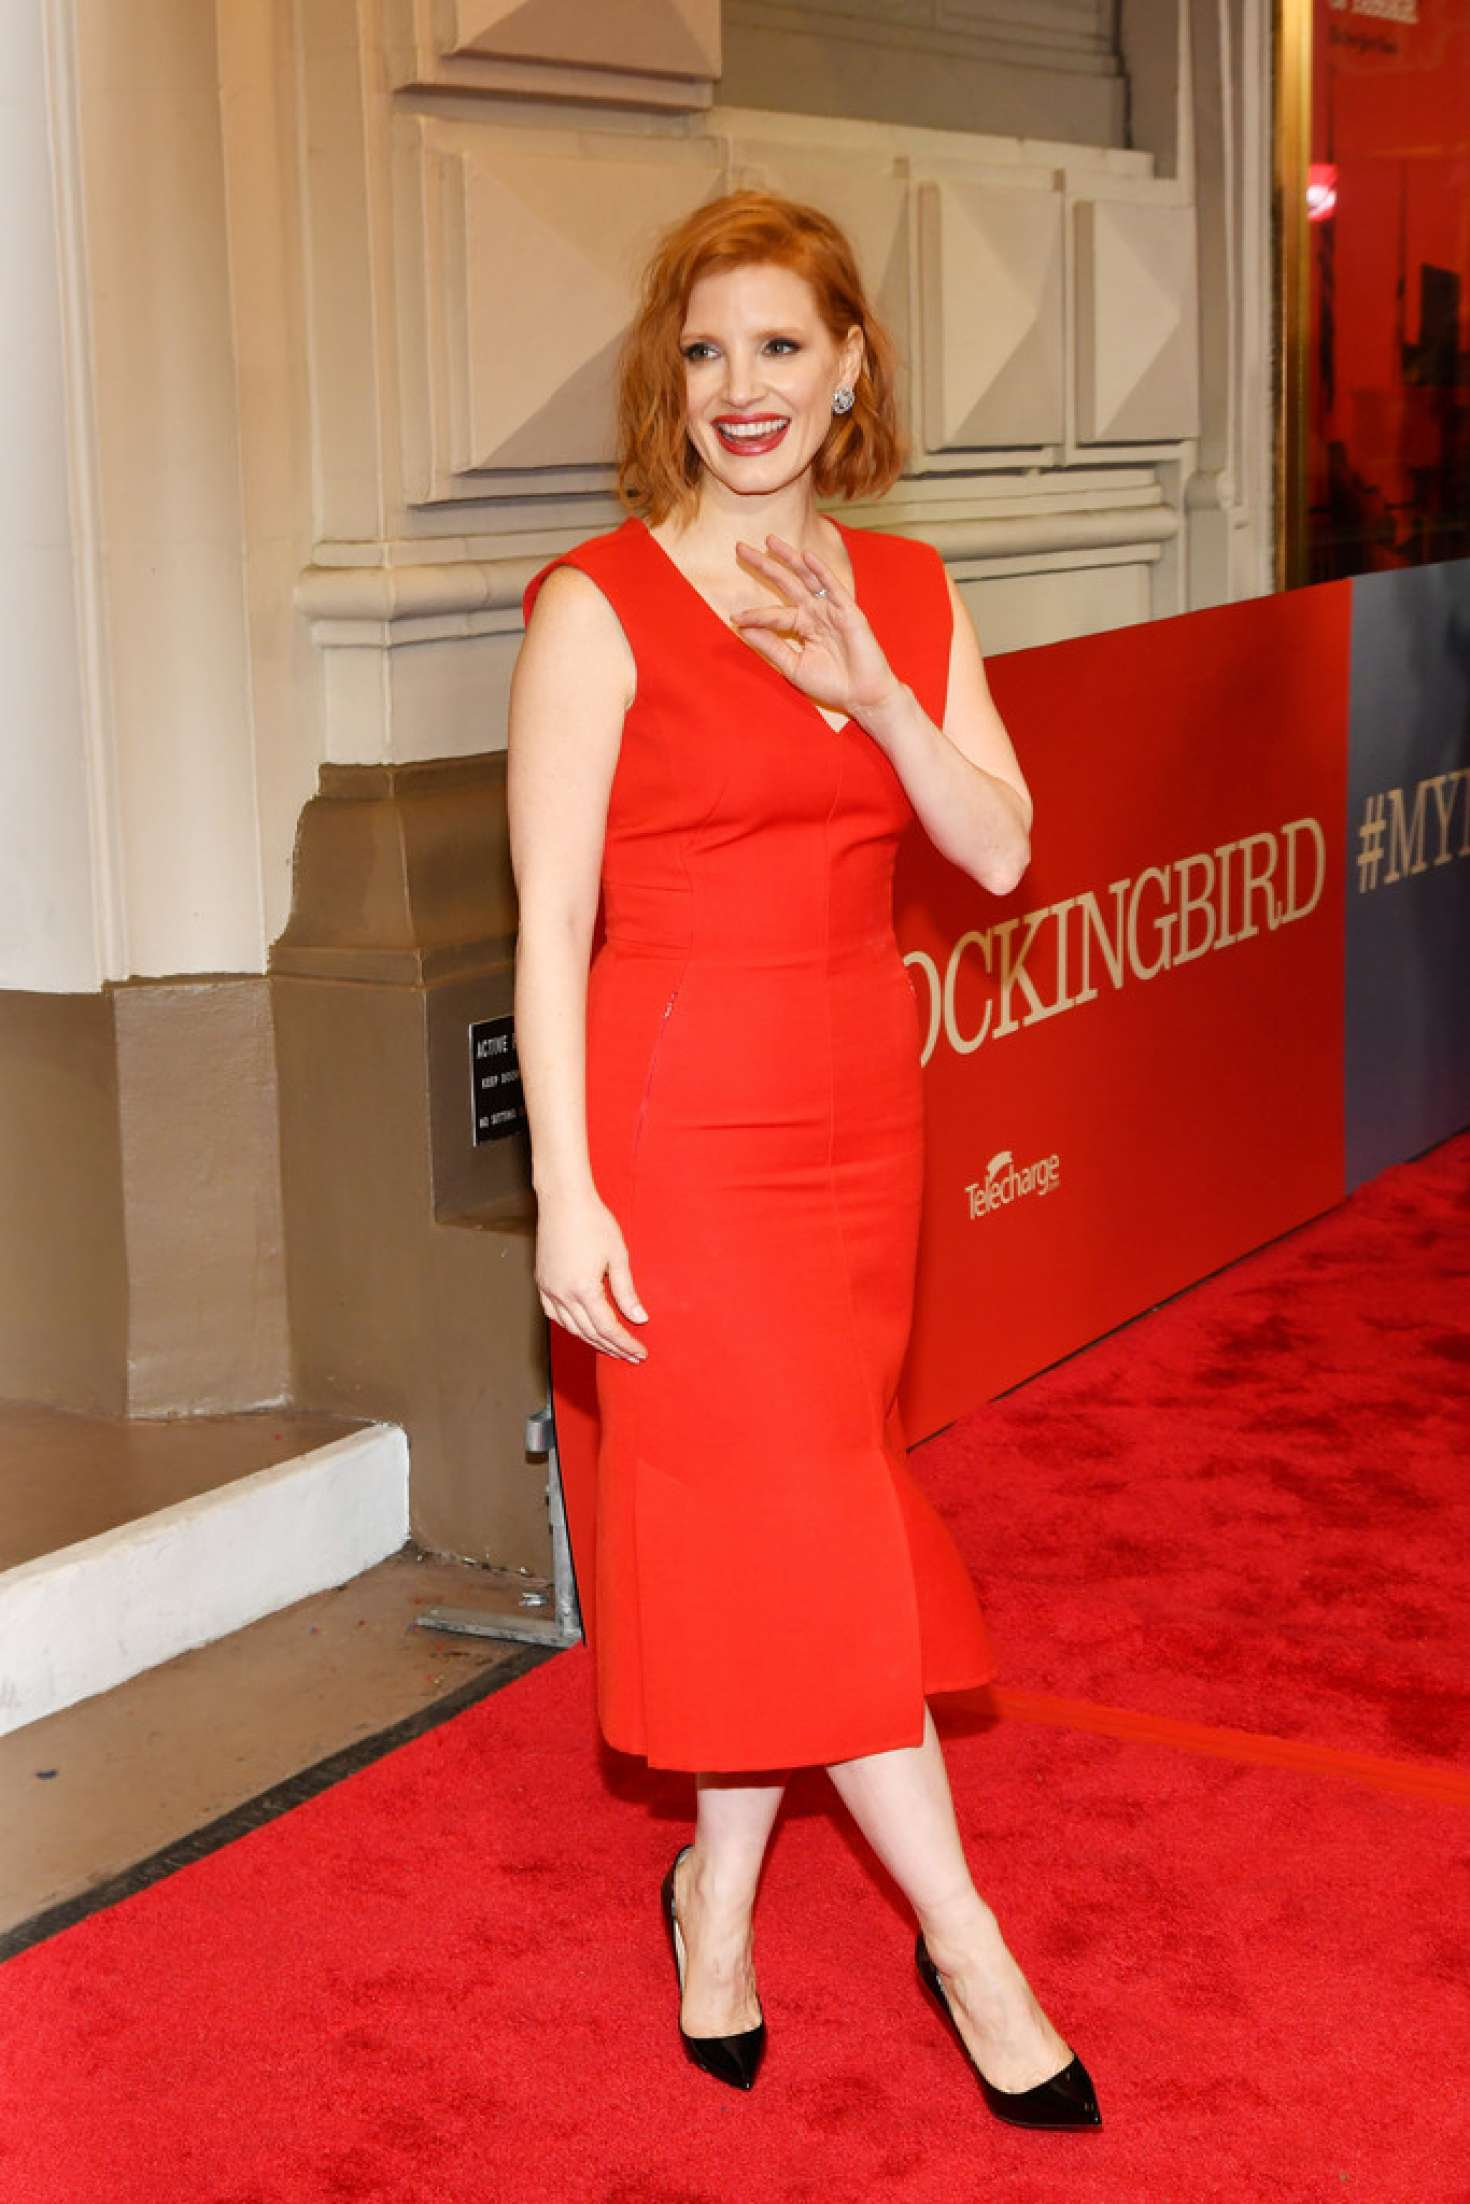 Jessica Chastain 2018 : Jessica Chastain: To Kill A Mockingbird Opening Night -02